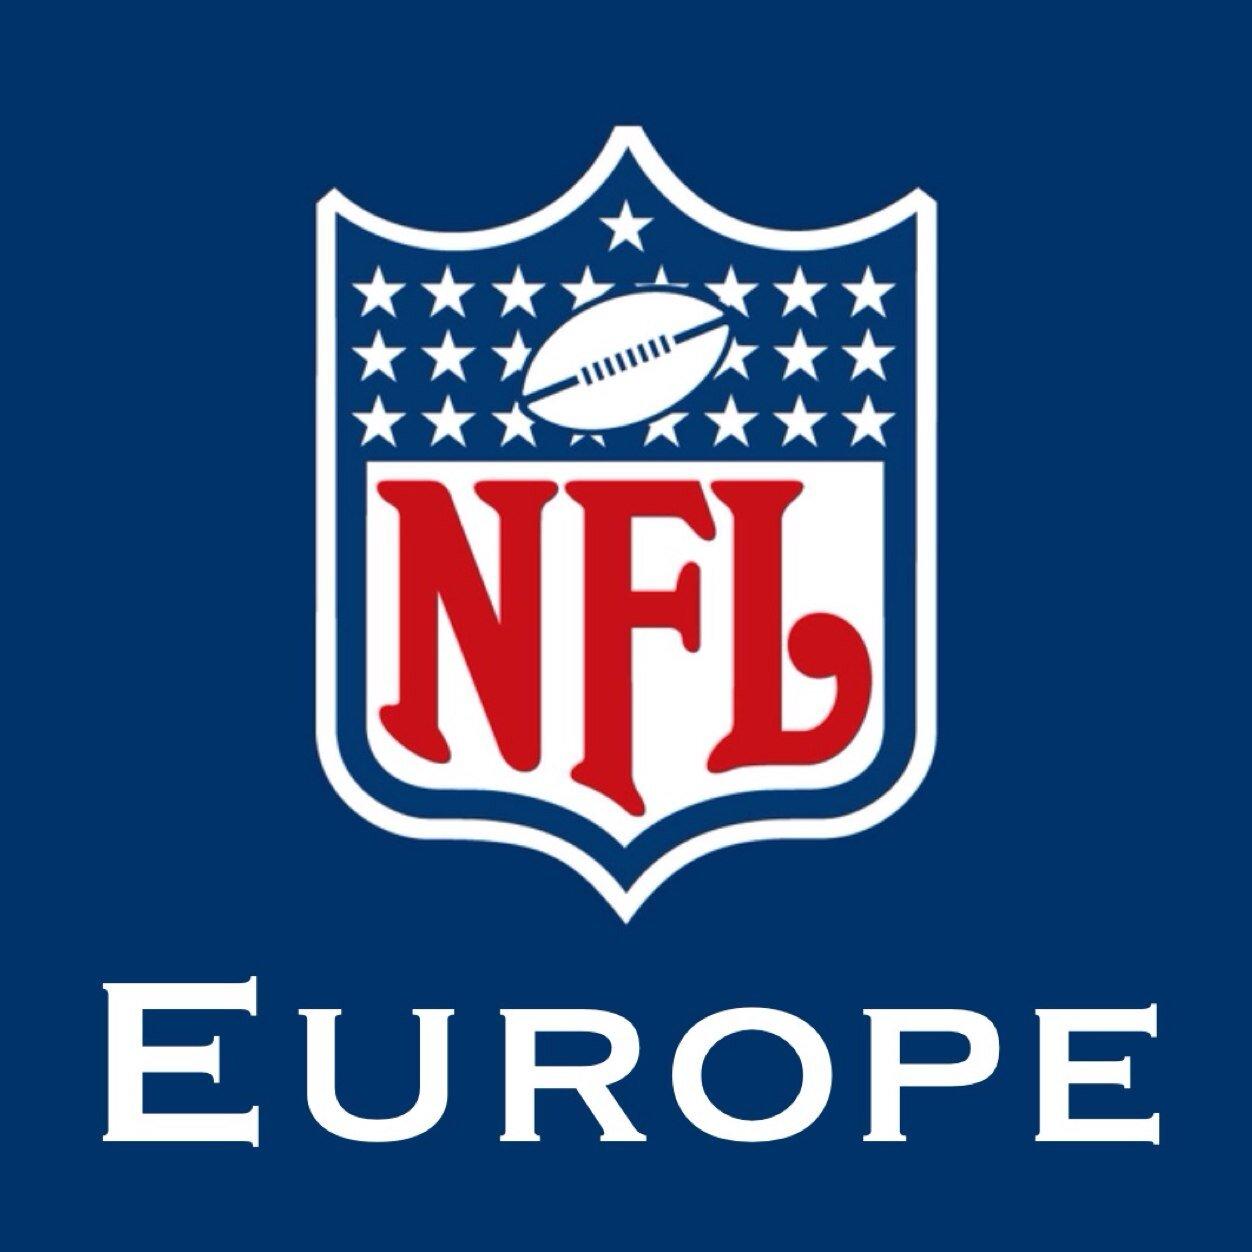 Nfl Europe Nfleurope Twitter